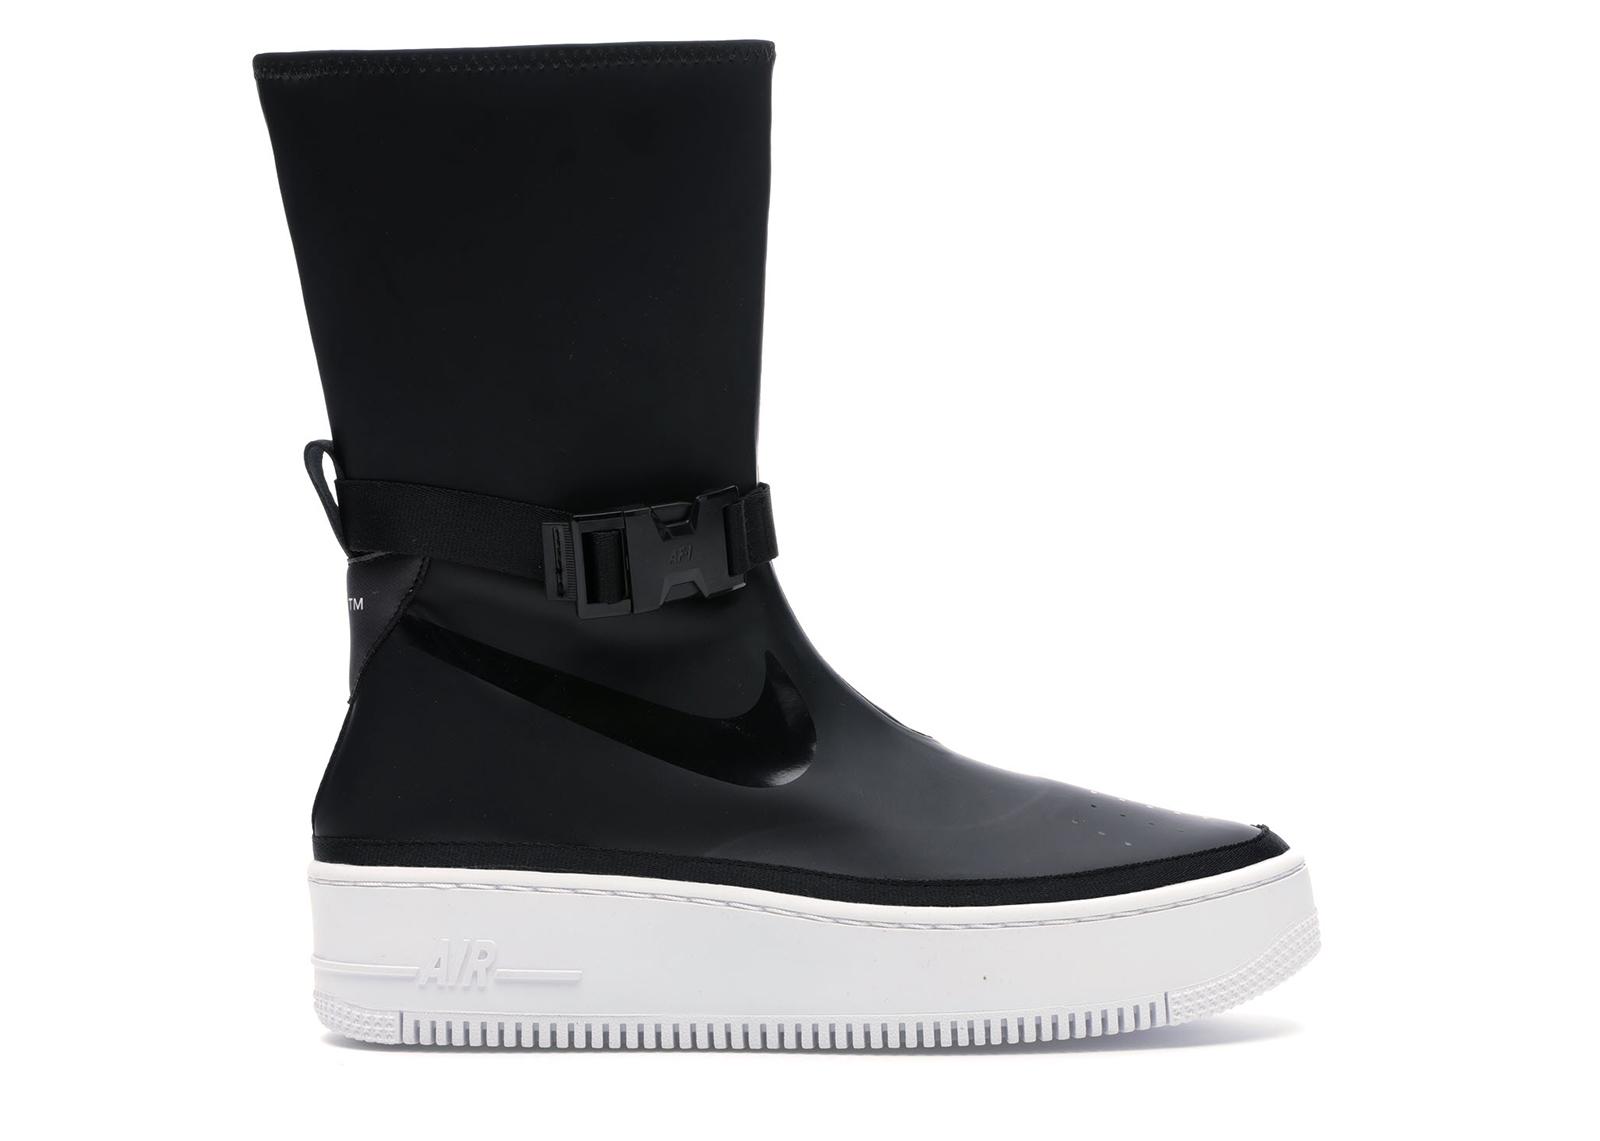 Nike Air Force 1 Sage High Black (W)